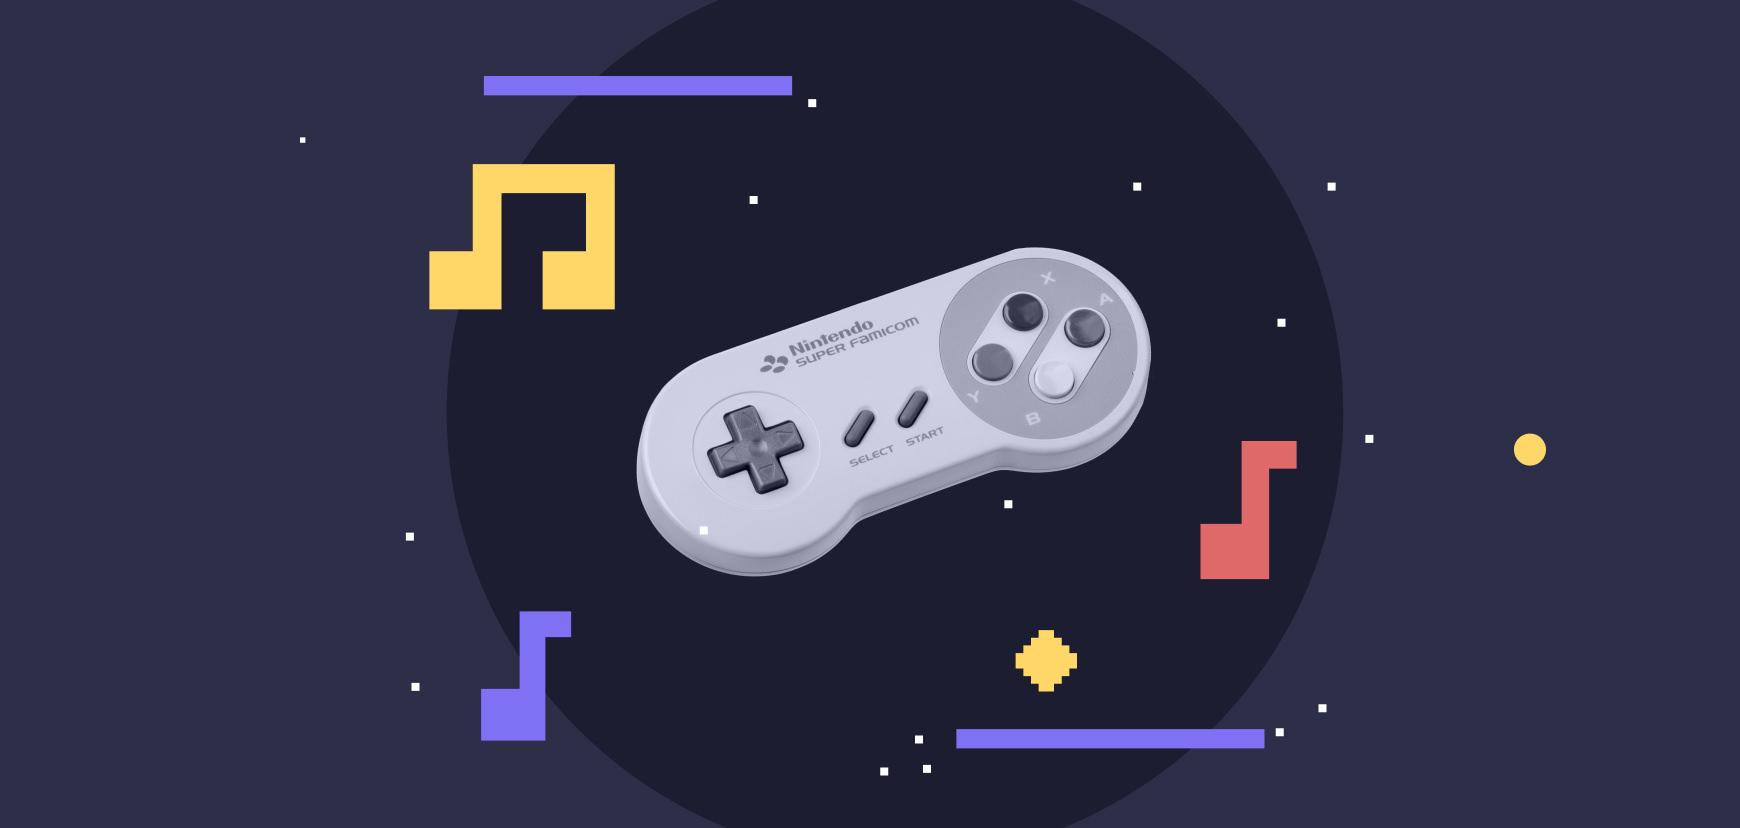 18 Retro Royalty Free 8-Bit Music Tracks for Video Games